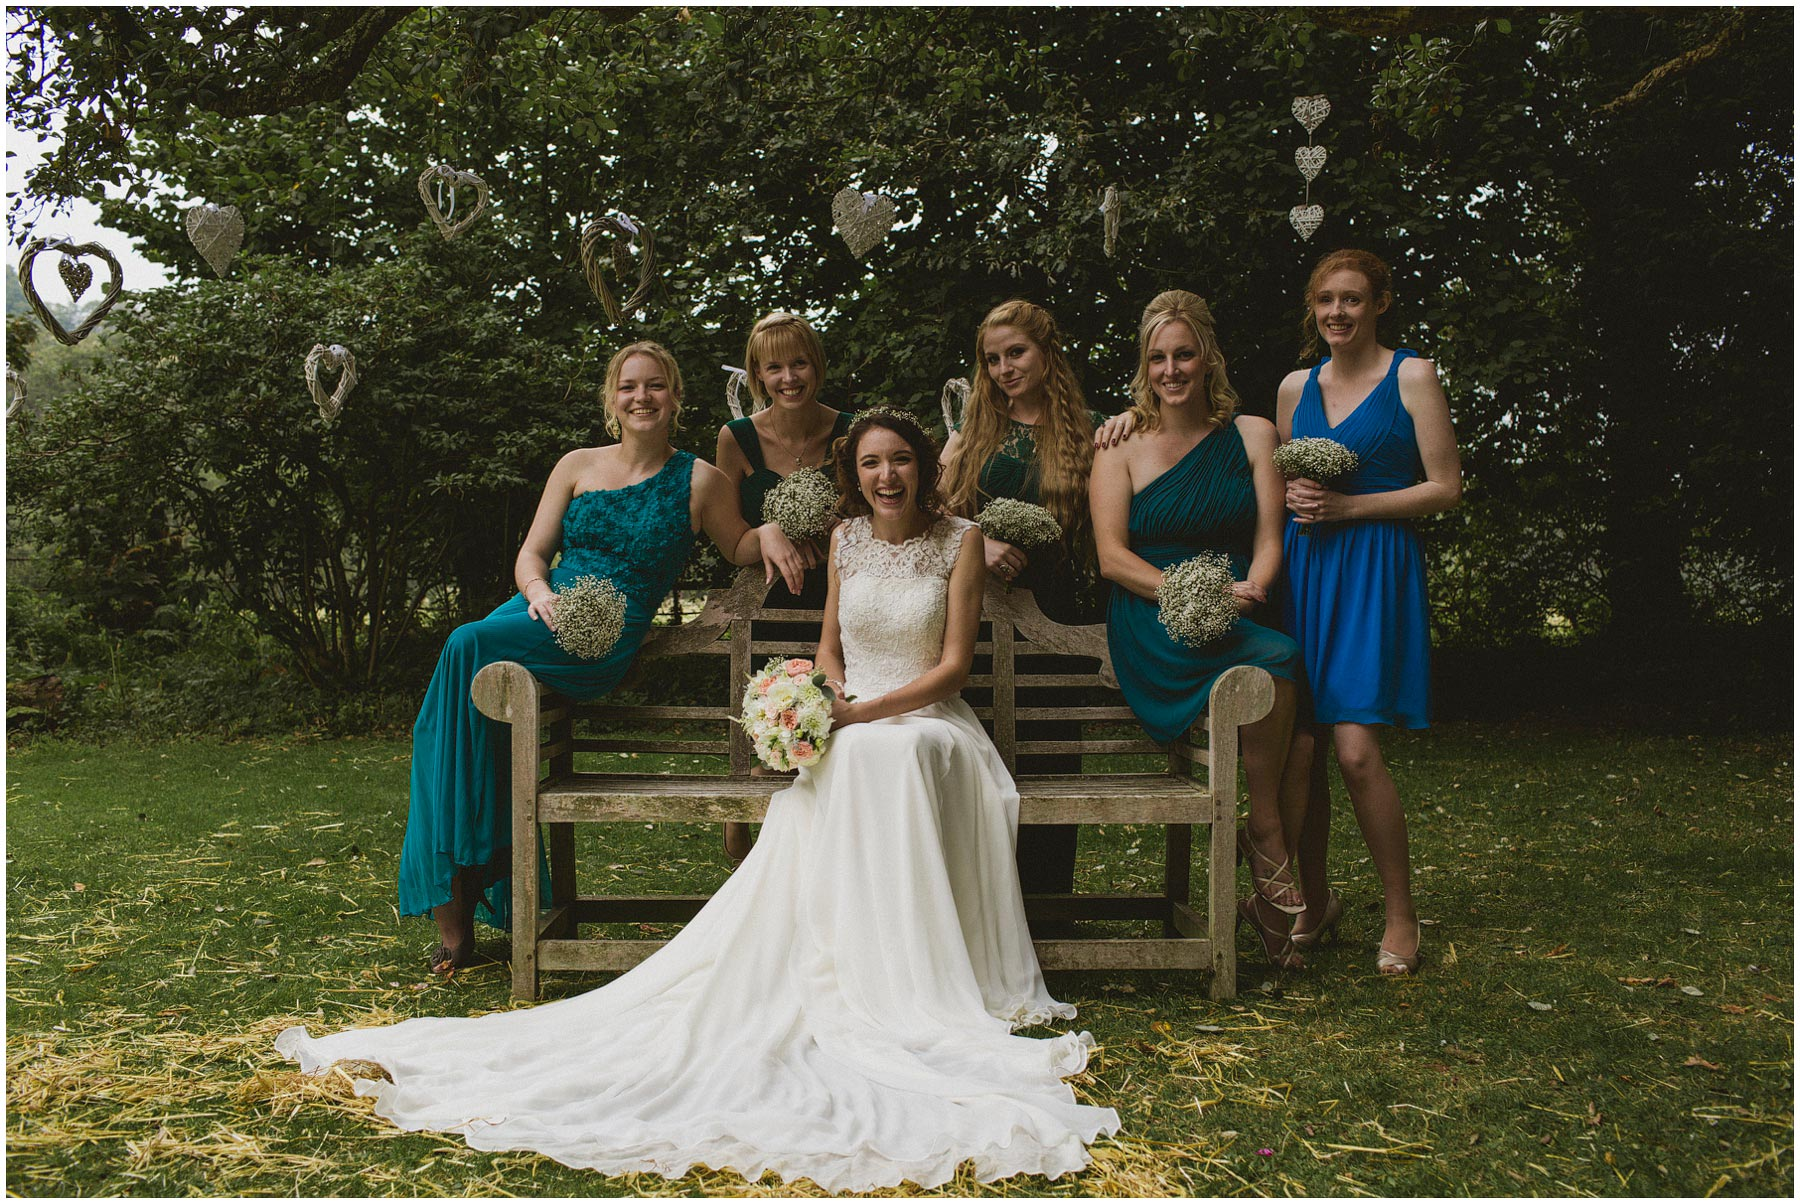 Colehayes-Park-Wedding-Photography_0150